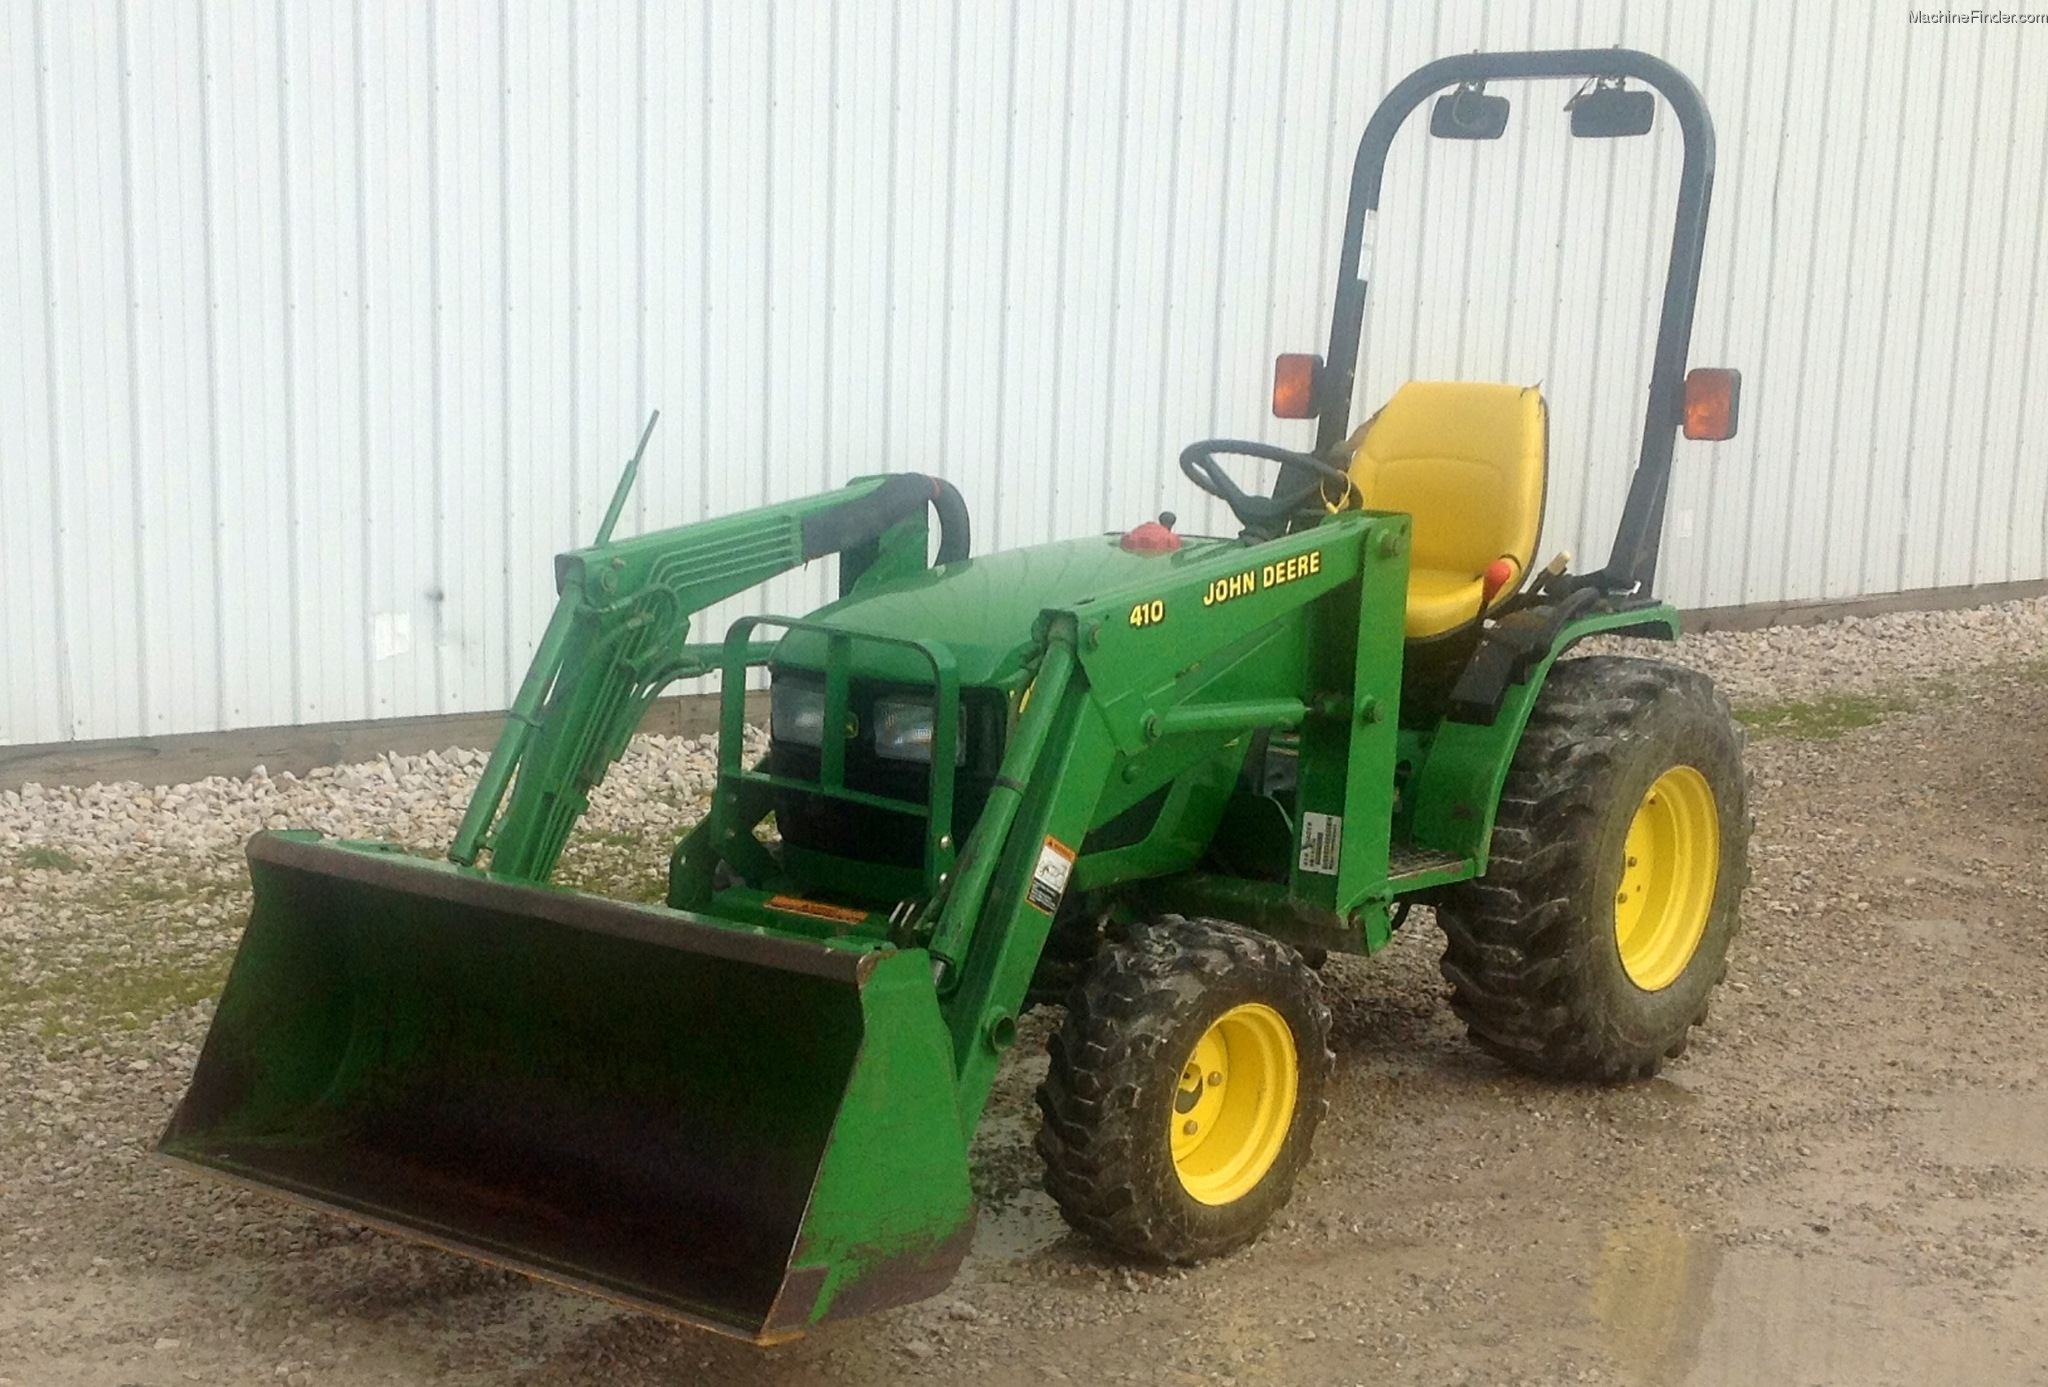 1999 John Deere 4100 Tractors - Compact (1-40hp.) - John ...